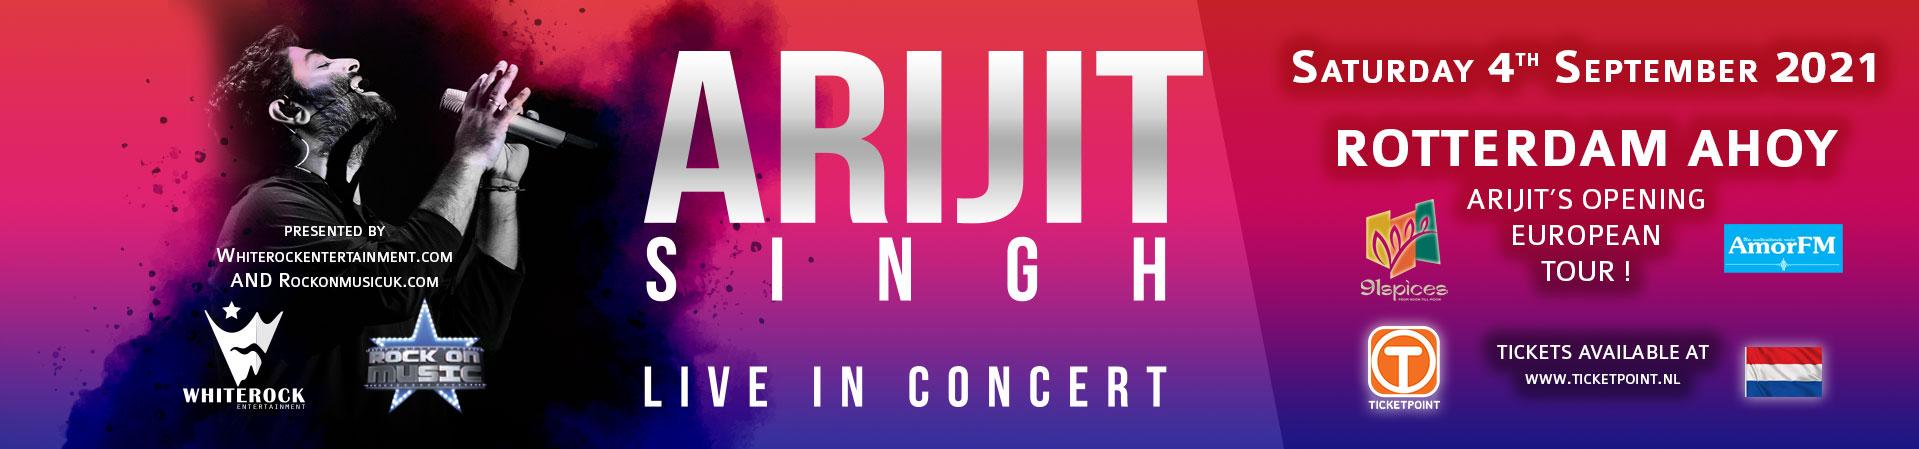 arijit-singh-banner-2021